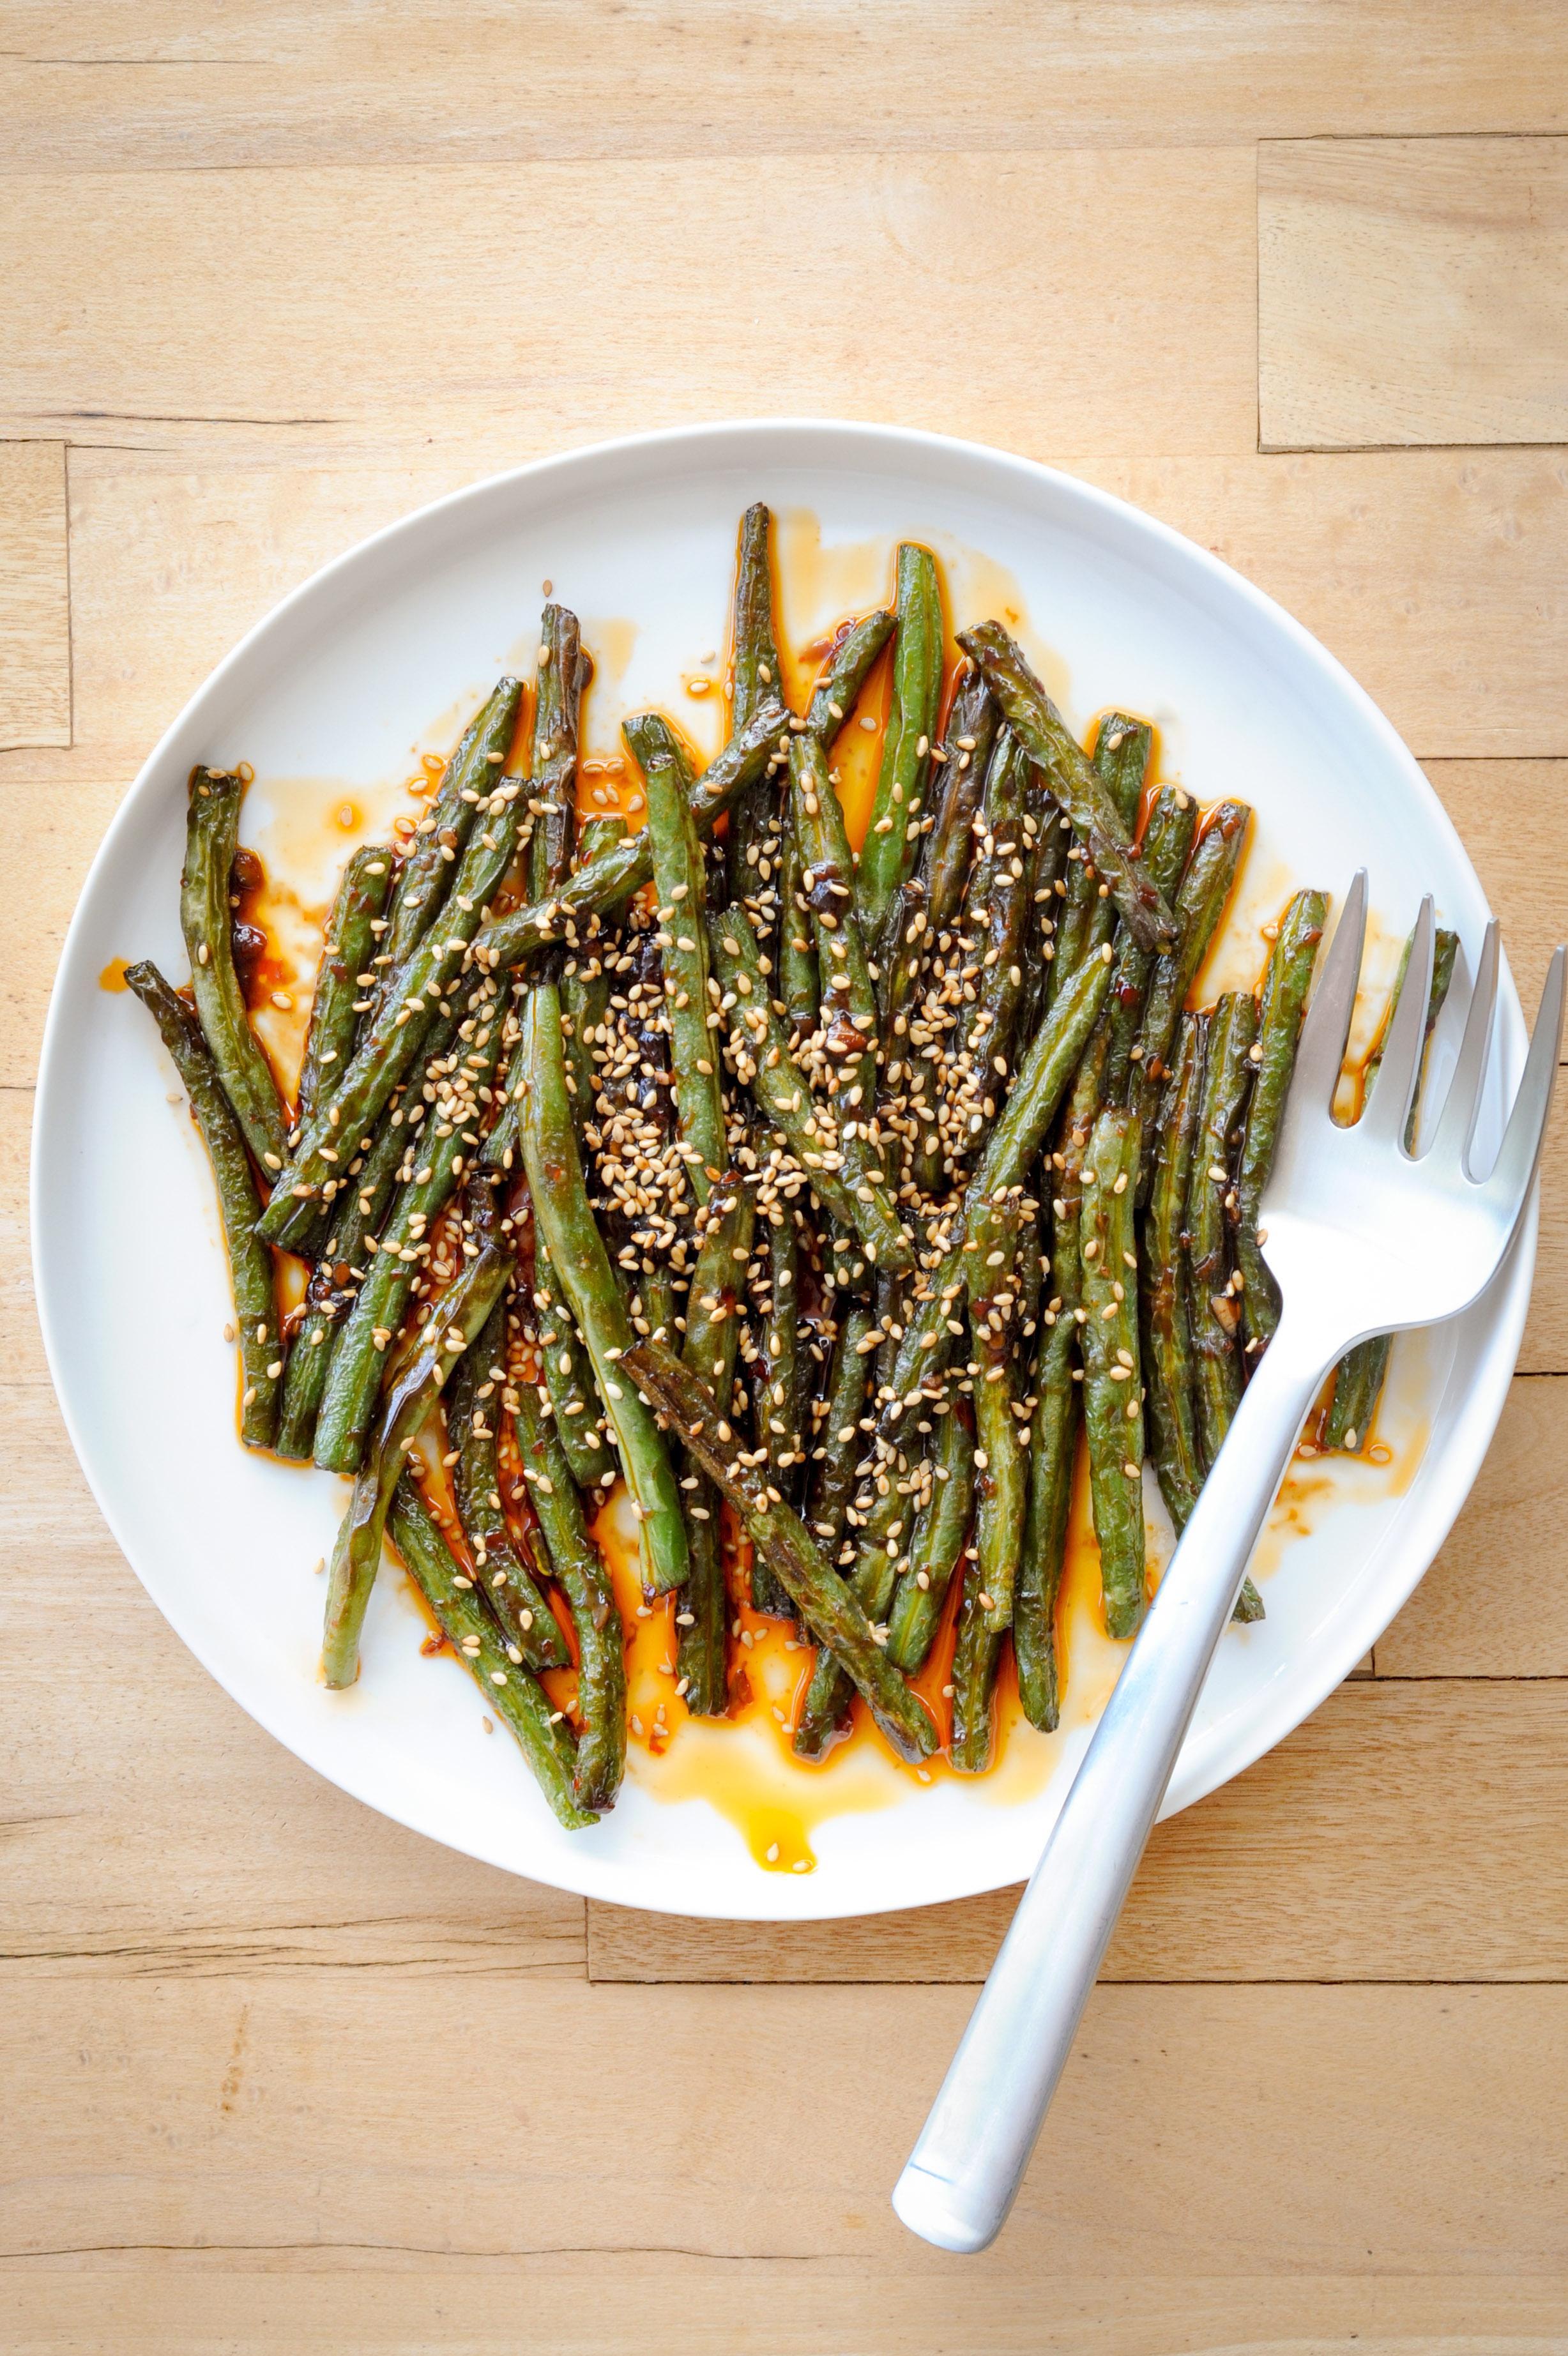 Szechuan-Style Green Beans | amodestfeast.com | @amodestfeast